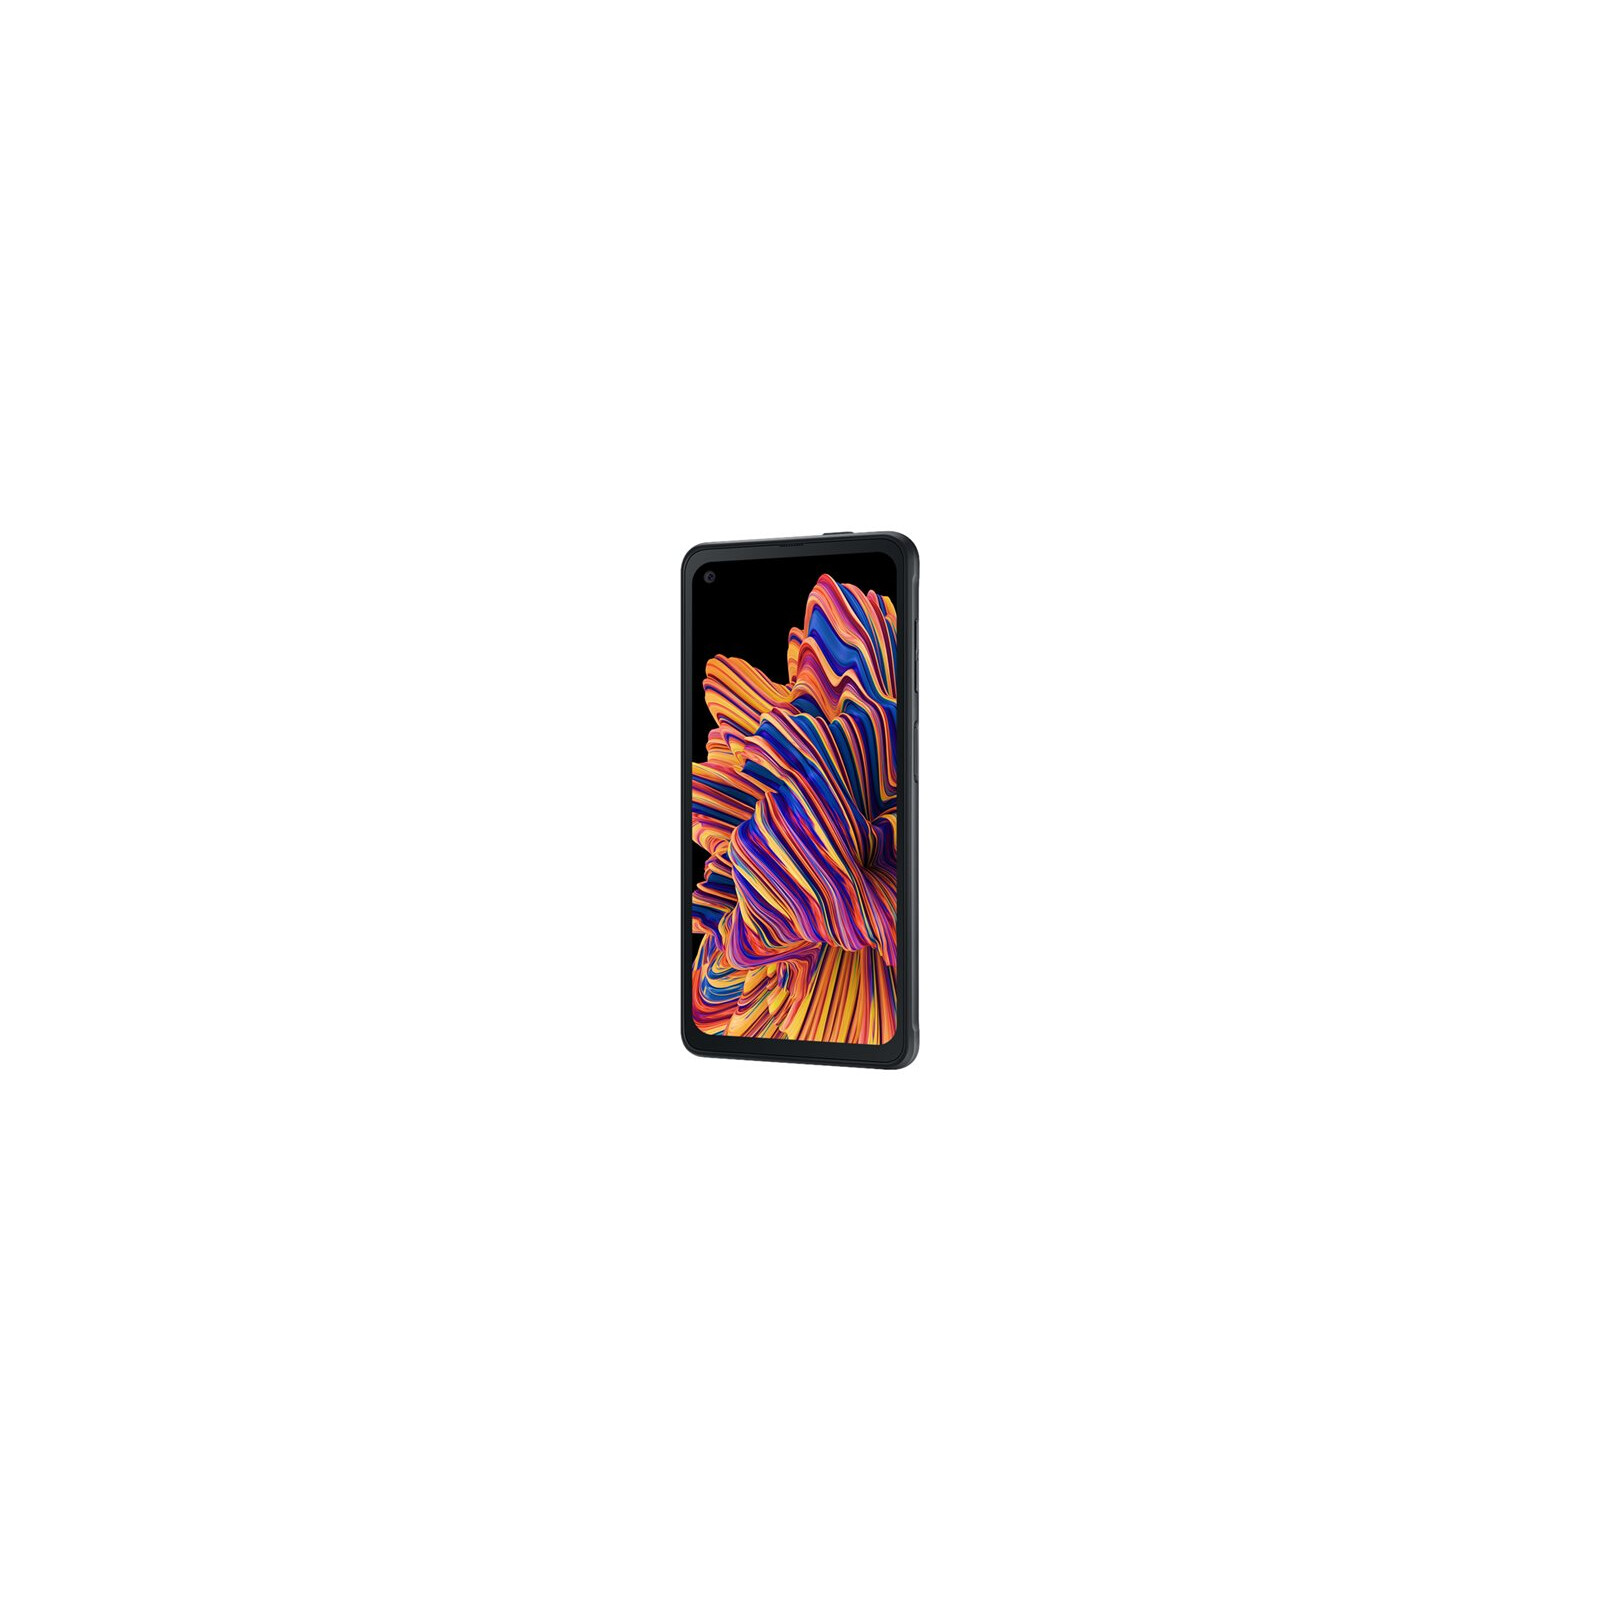 Samsung Galaxy Xcover Pro Enterprise Edition 64GB